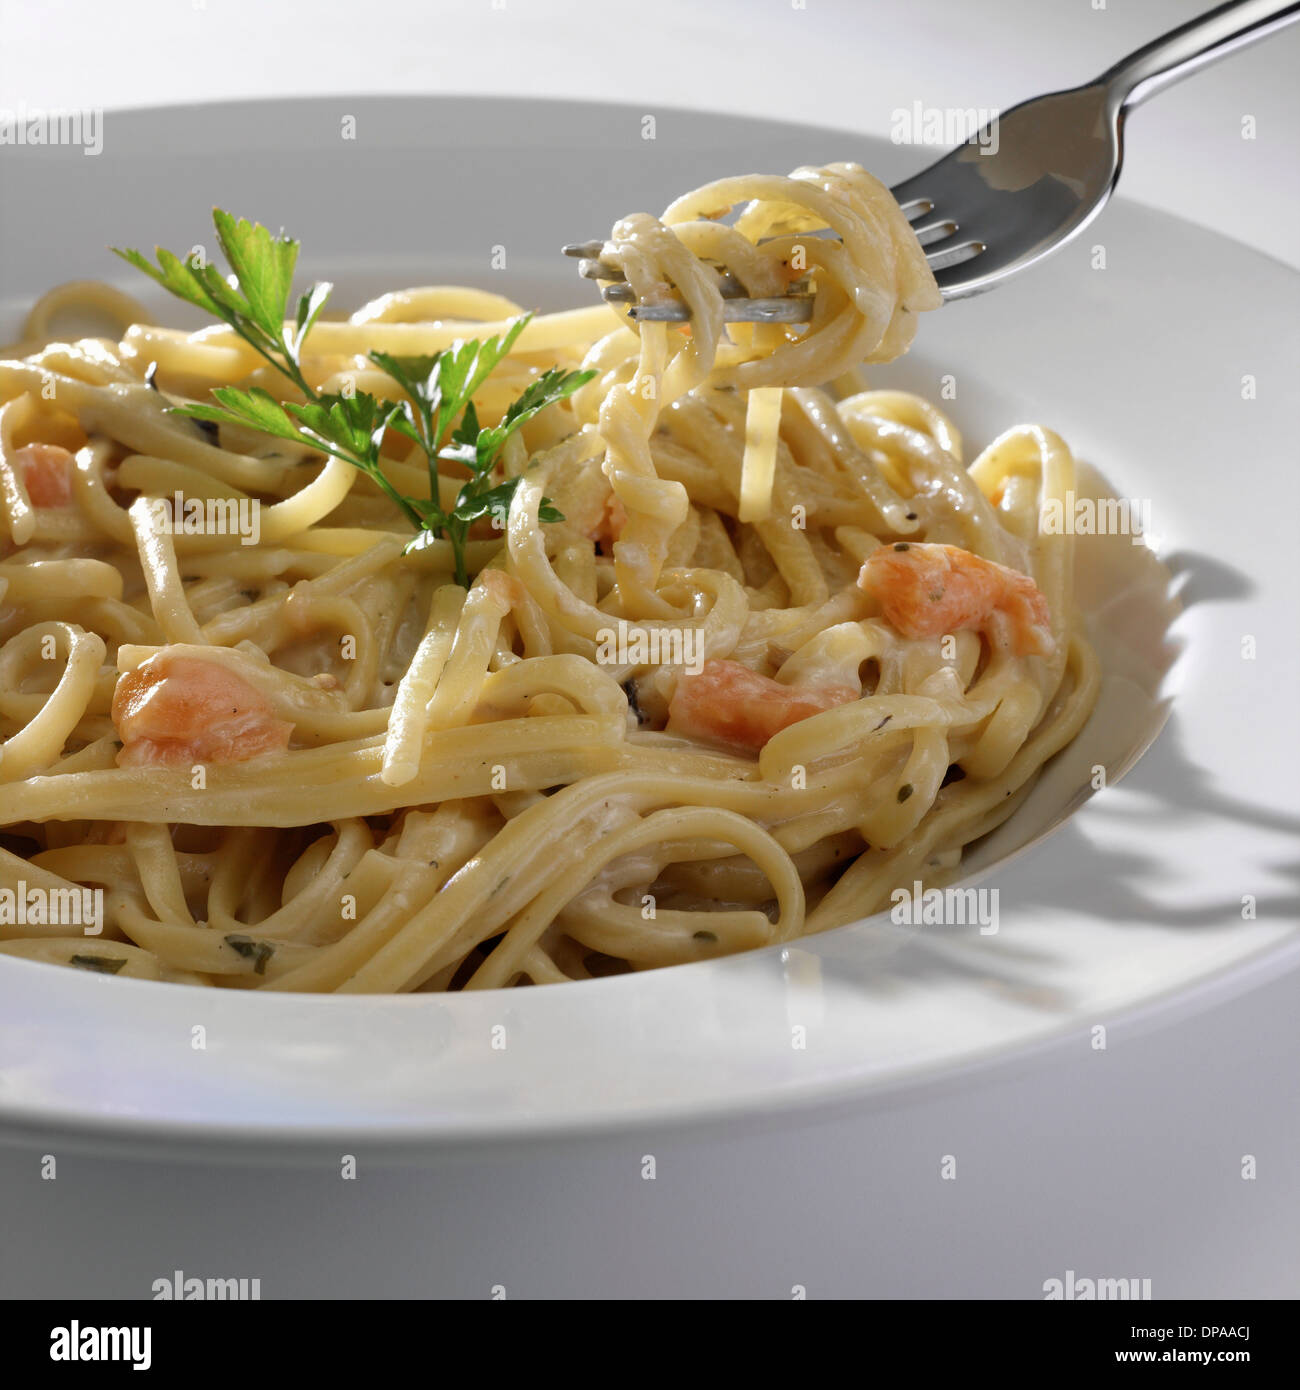 Bowl of seafood pasta - Stock Image